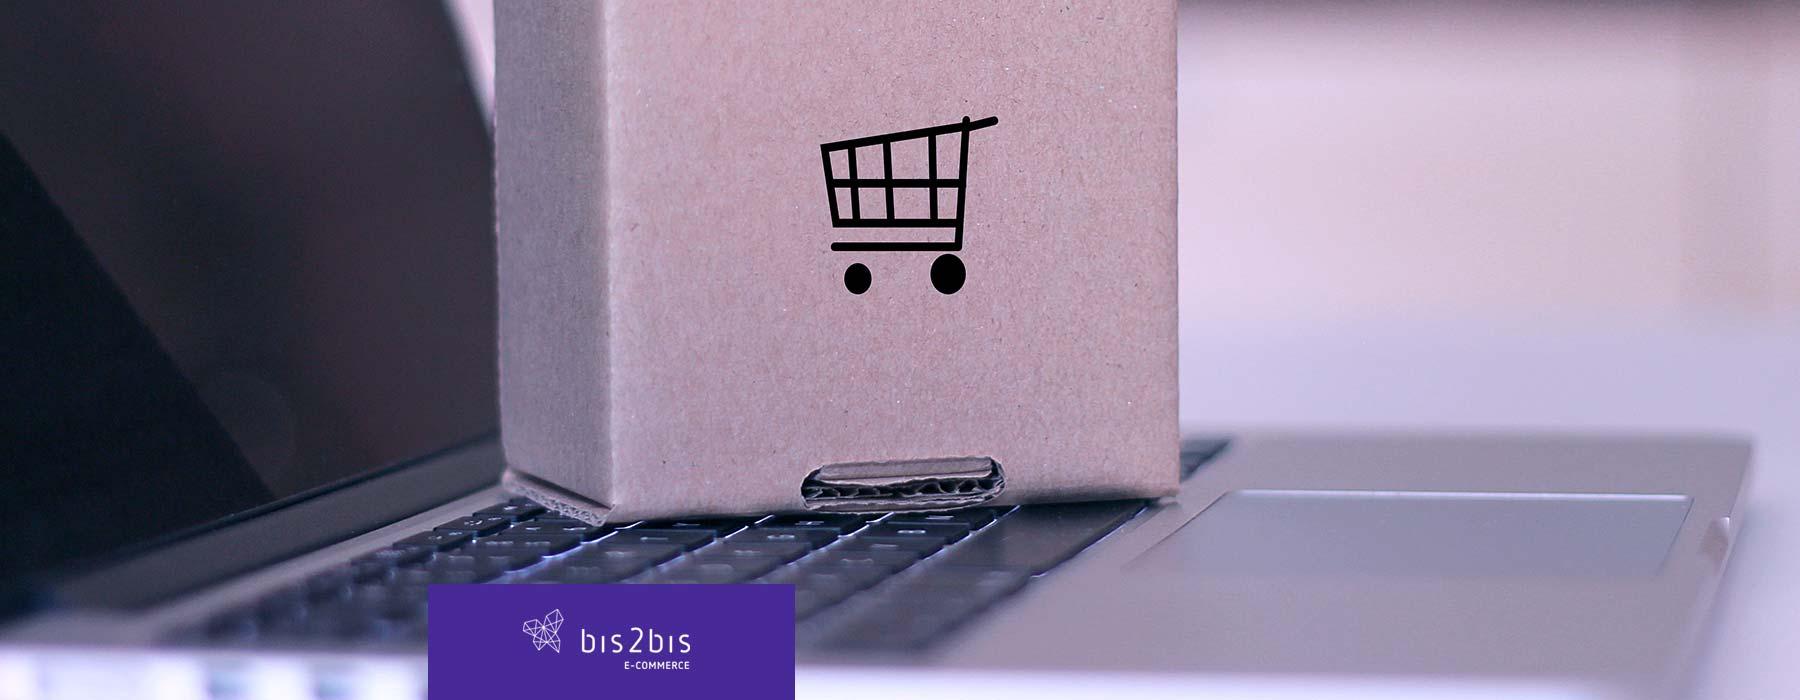 entrega rápida e-commerce